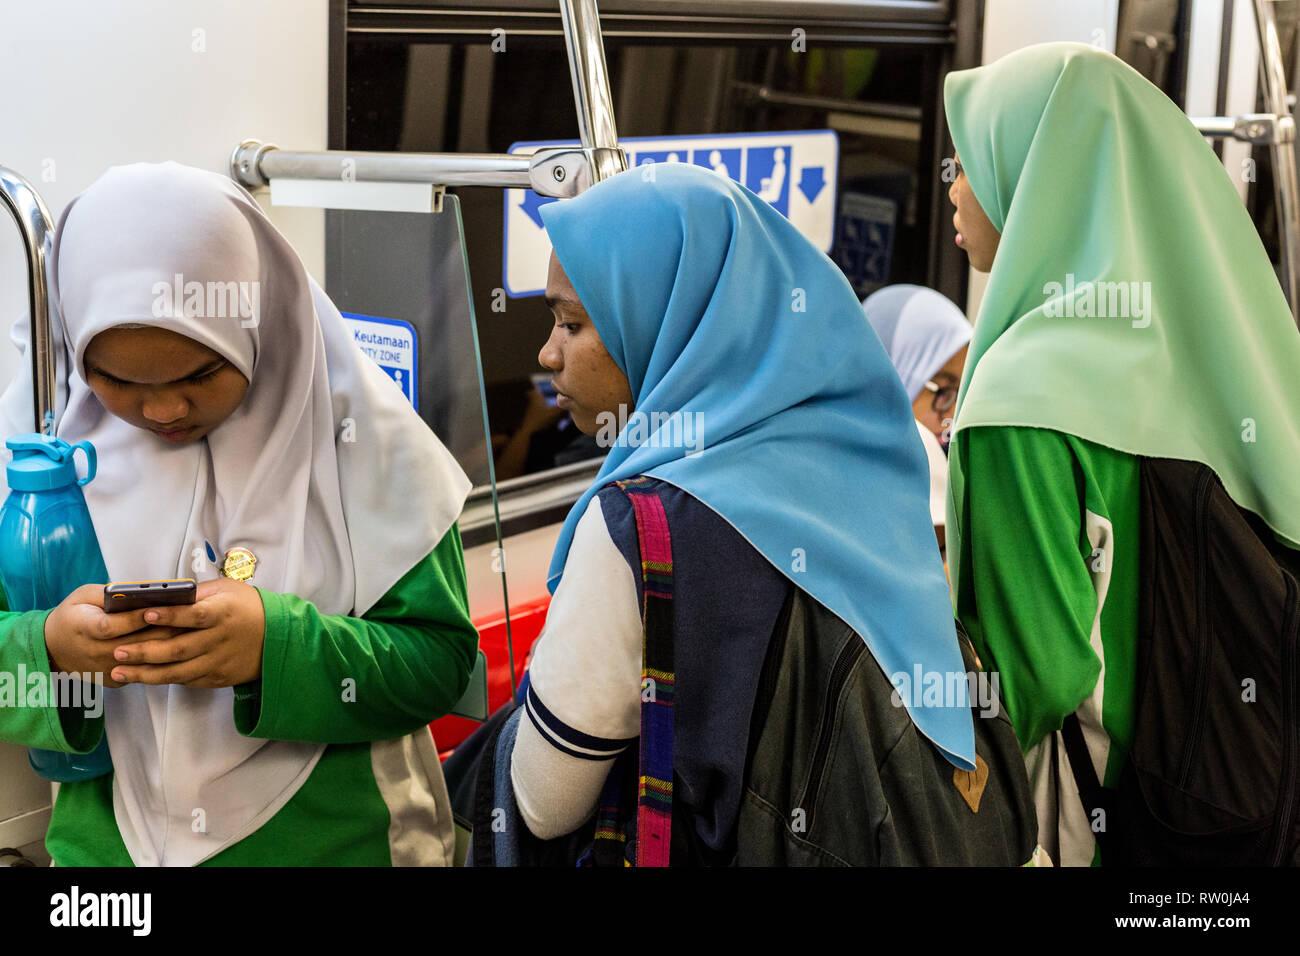 Las niñas en Malasia adolescente típica vestimenta musulmana moderada esperando a bordo de un autobús, Kuala Lumpur, Malasia. Foto de stock